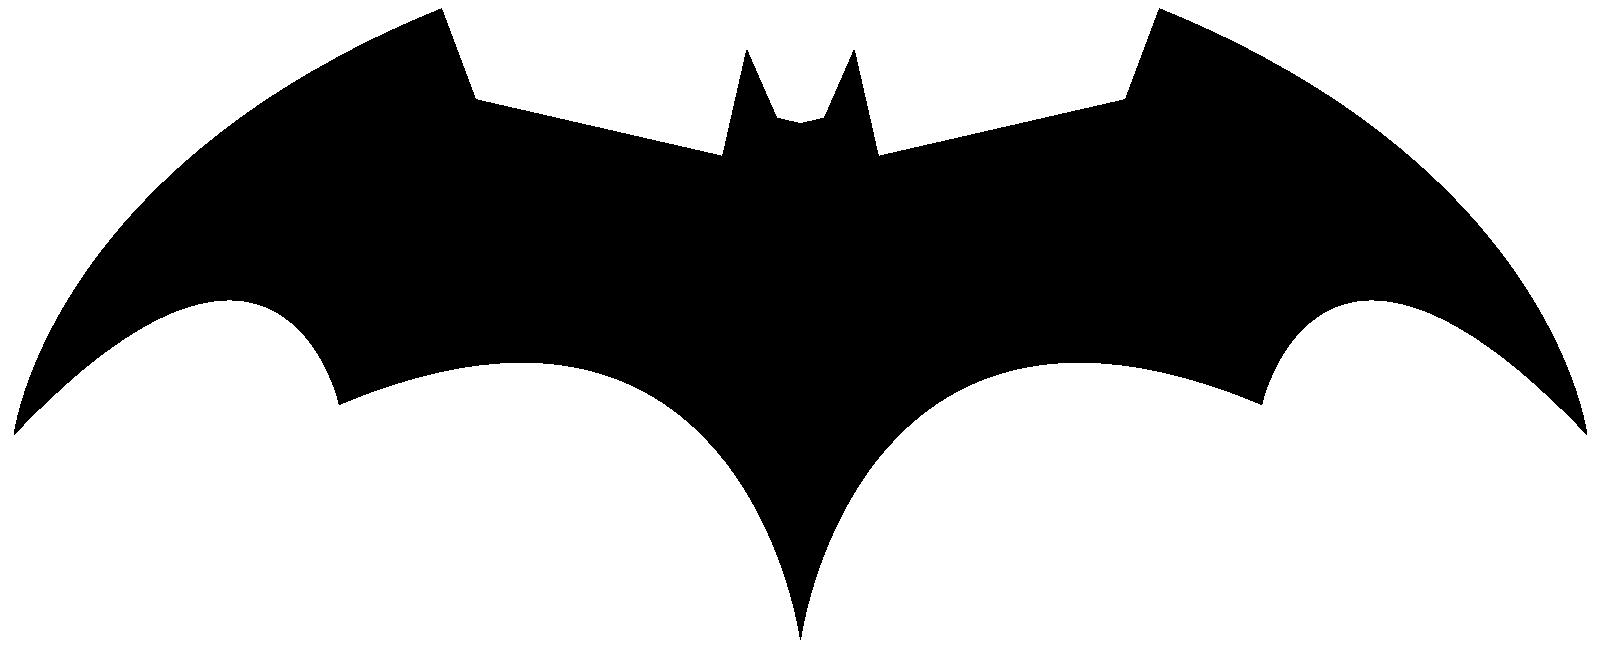 1600x656 Image